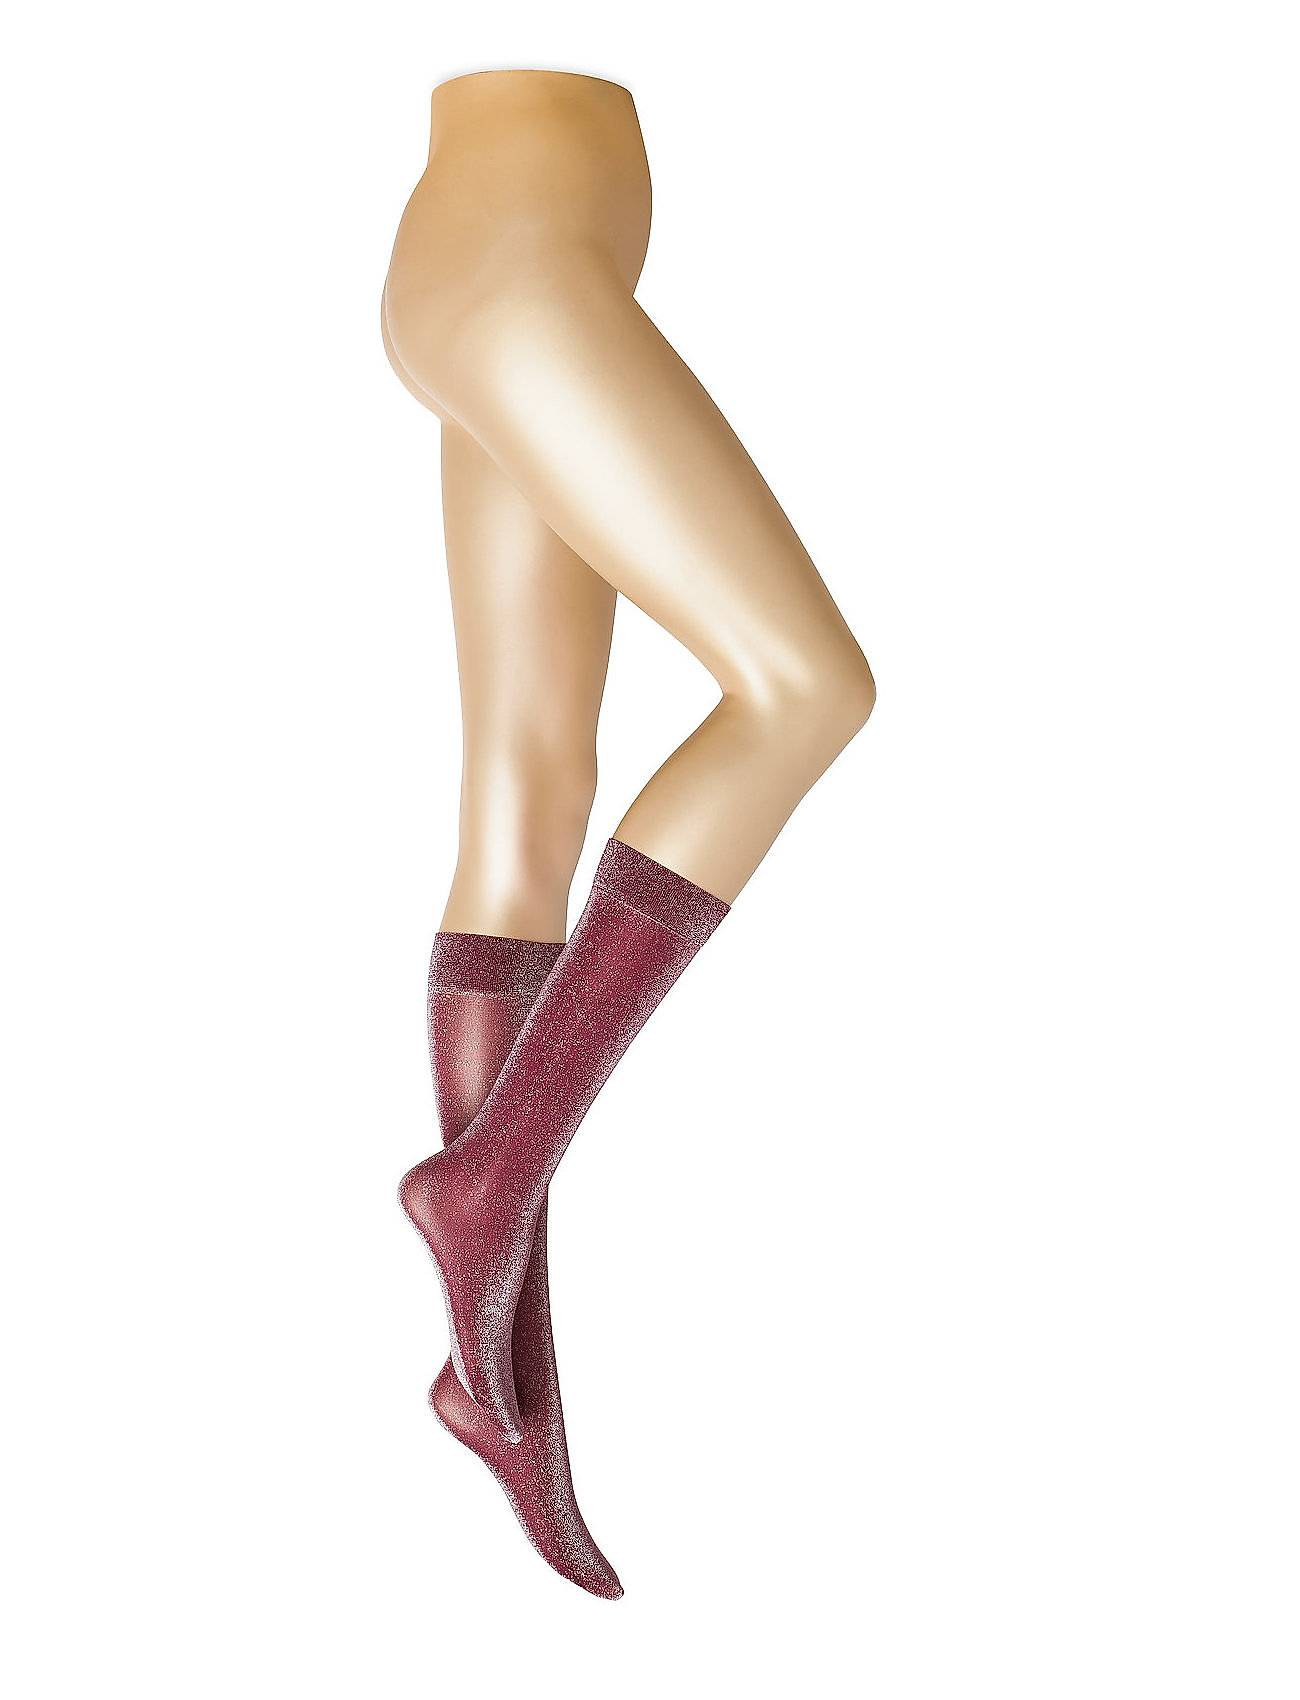 Swedish Stockings Ines Shimmery Sock Wine Lingerie Hosiery Knee High Socks Punainen Swedish Stockings